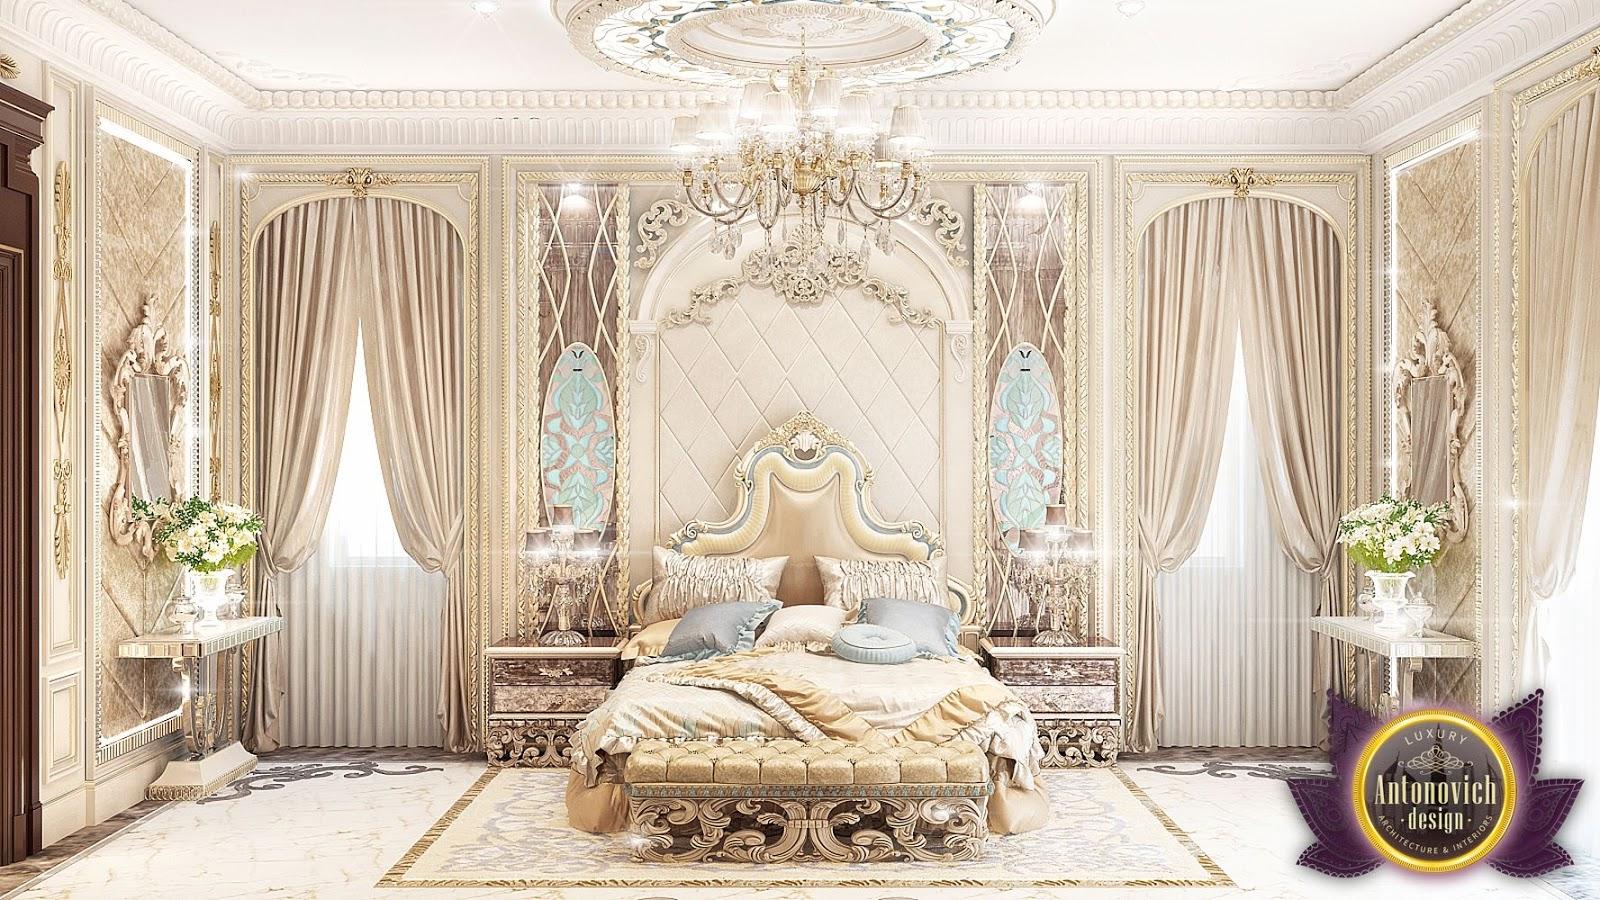 luxury bedroom interior design | nigeiradesign: Luxury Royal Arabic Master Bedroom of ...